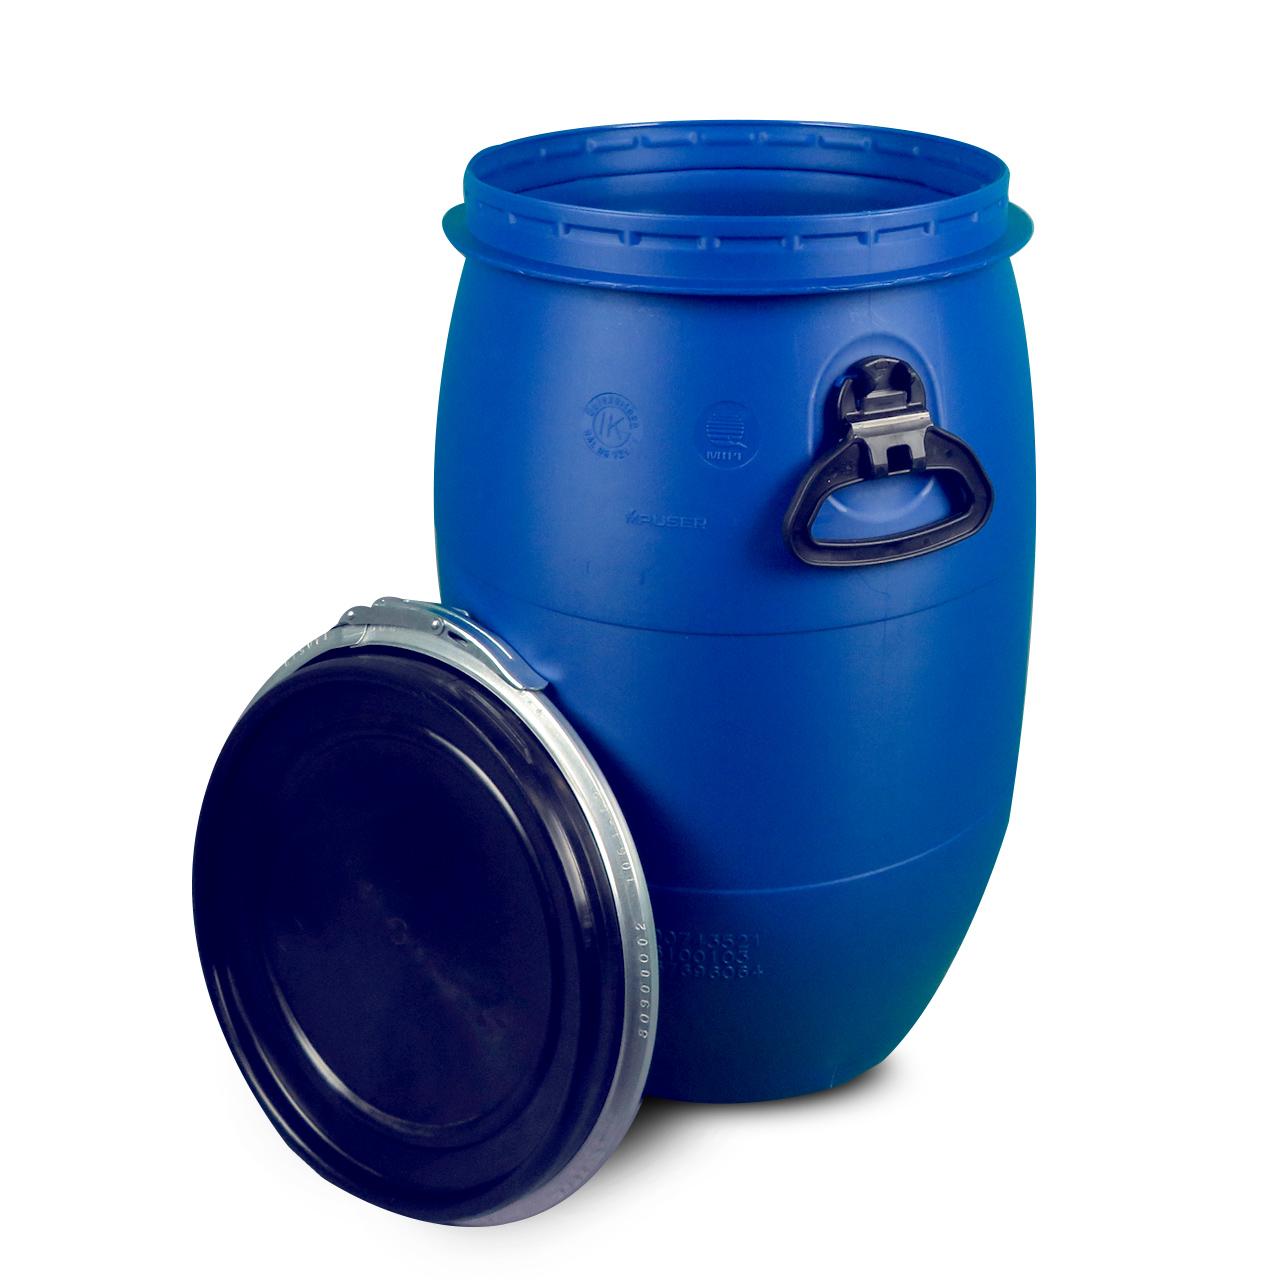 60 L Kunststoffdeckelfass, blau, Entgasung, MAUSER, UN